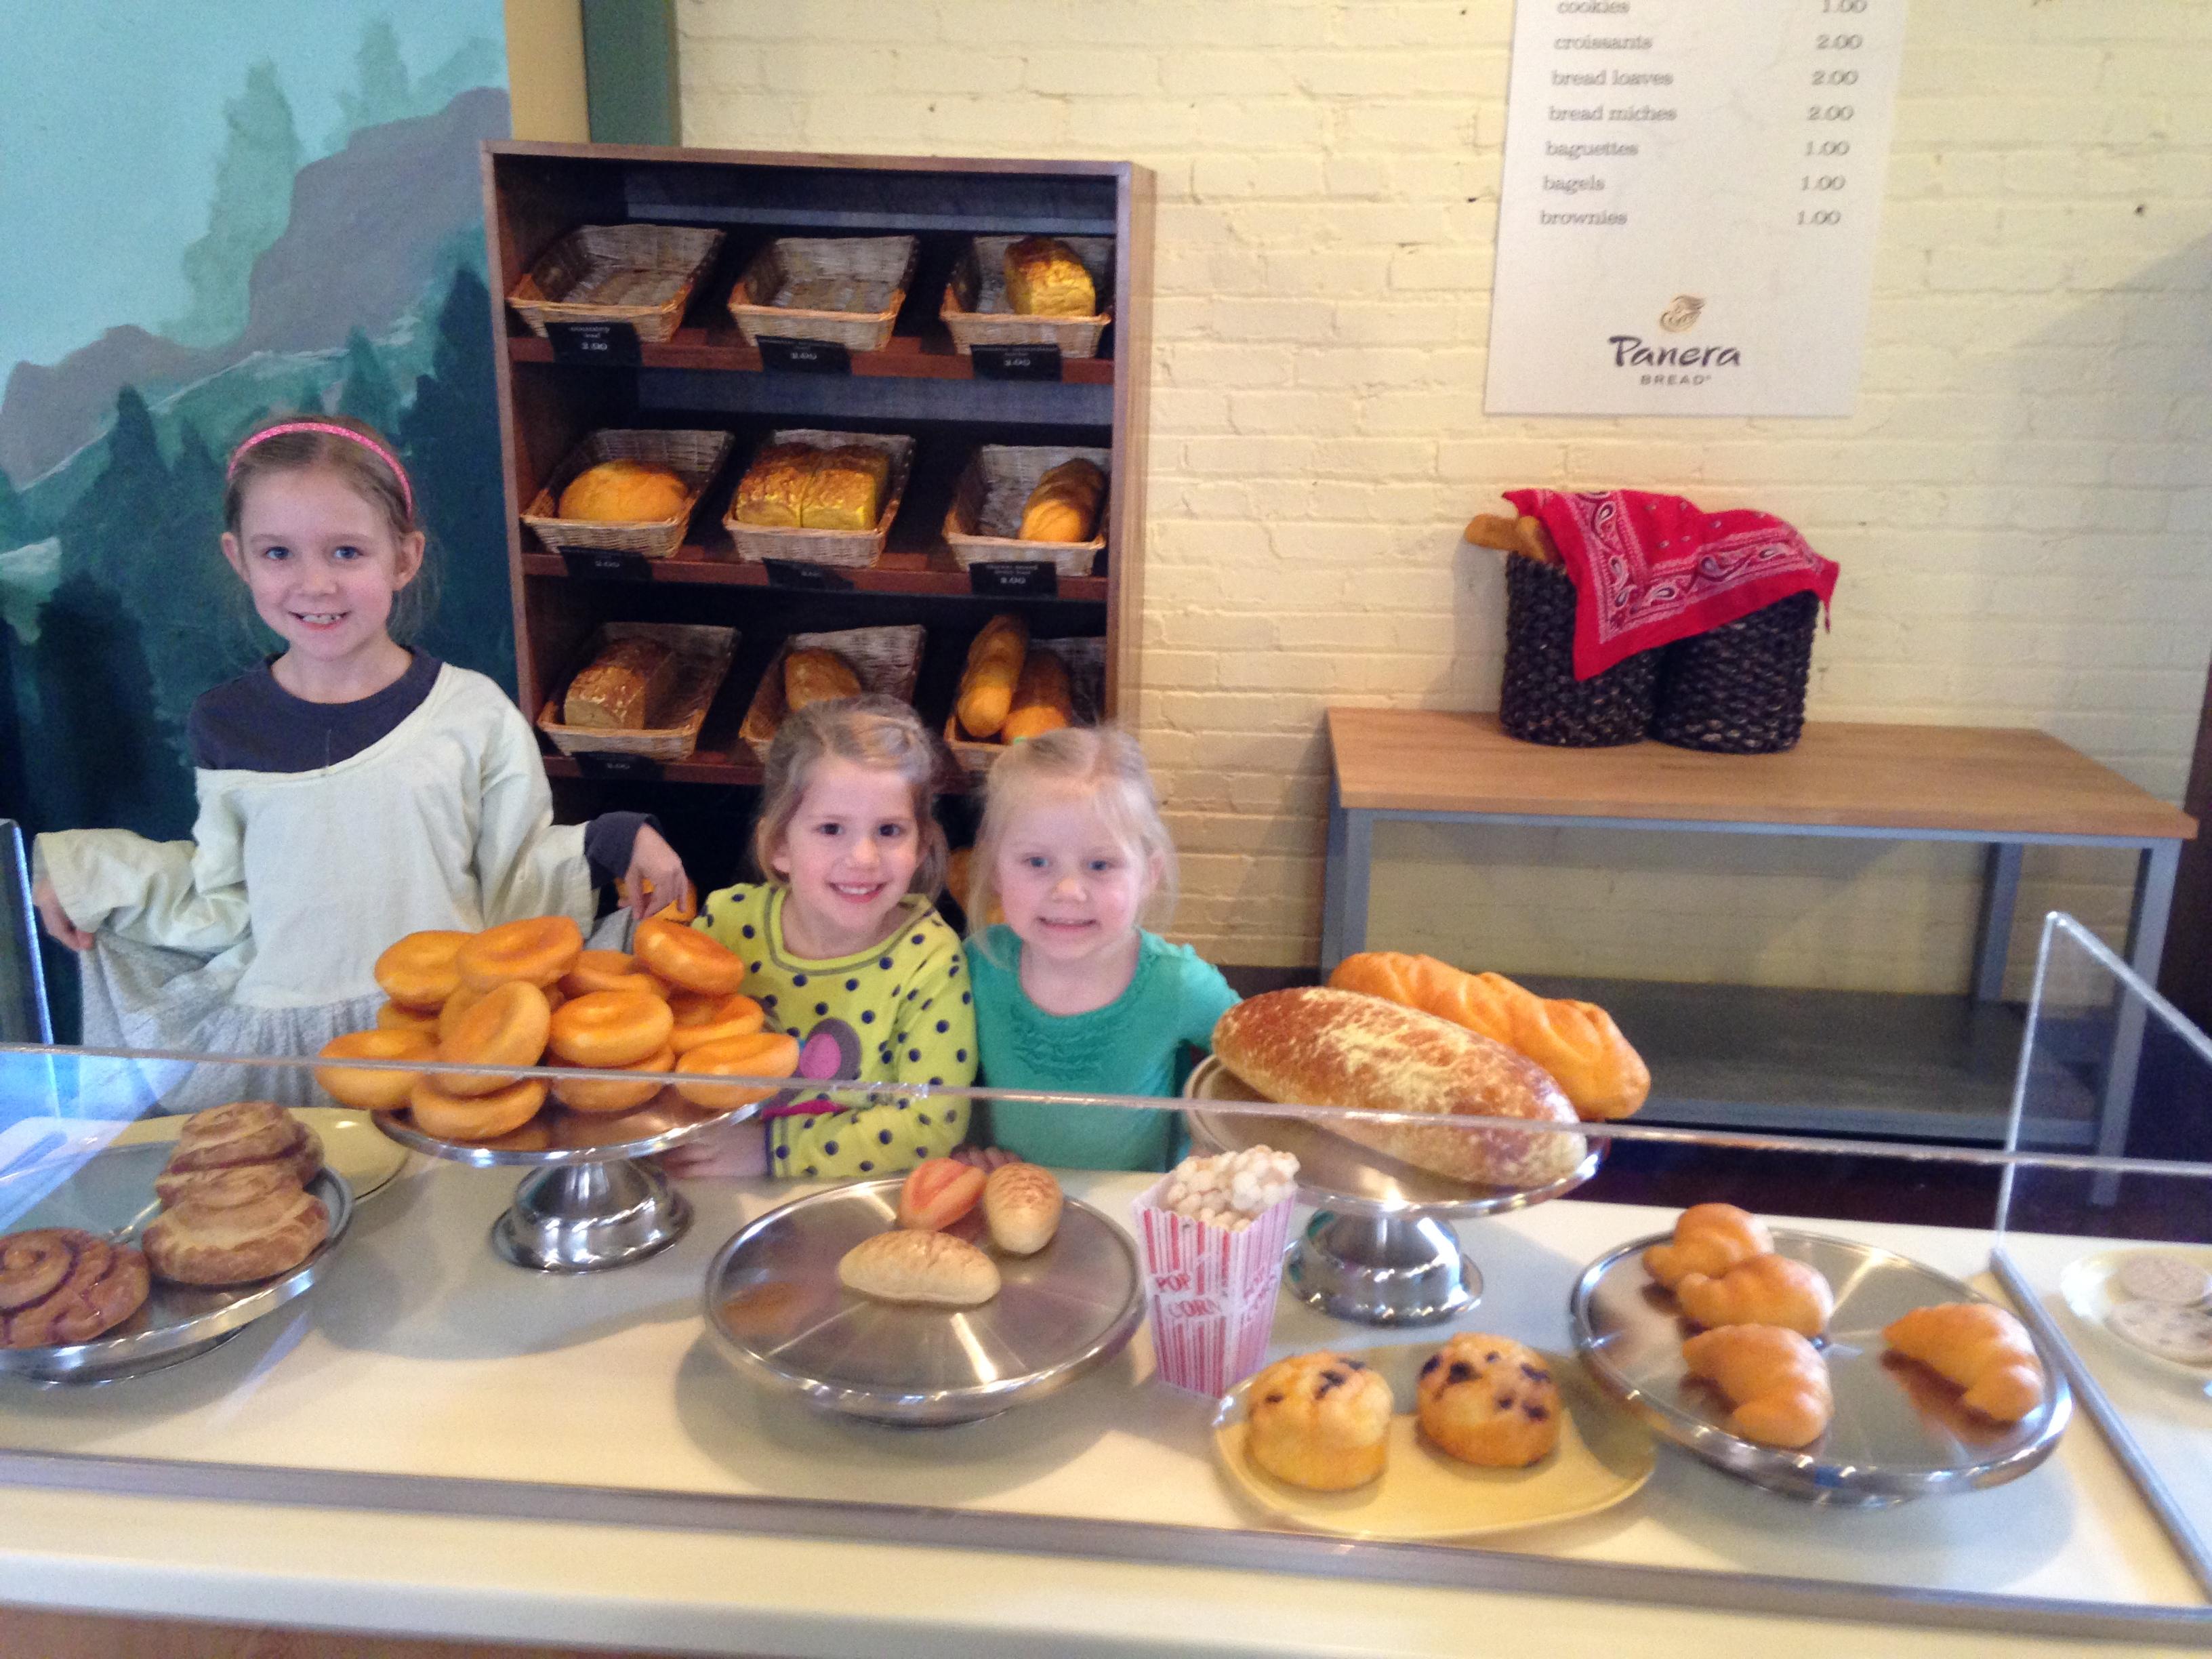 Gracie, Kaylin, & Corah running their Panera Bread store.